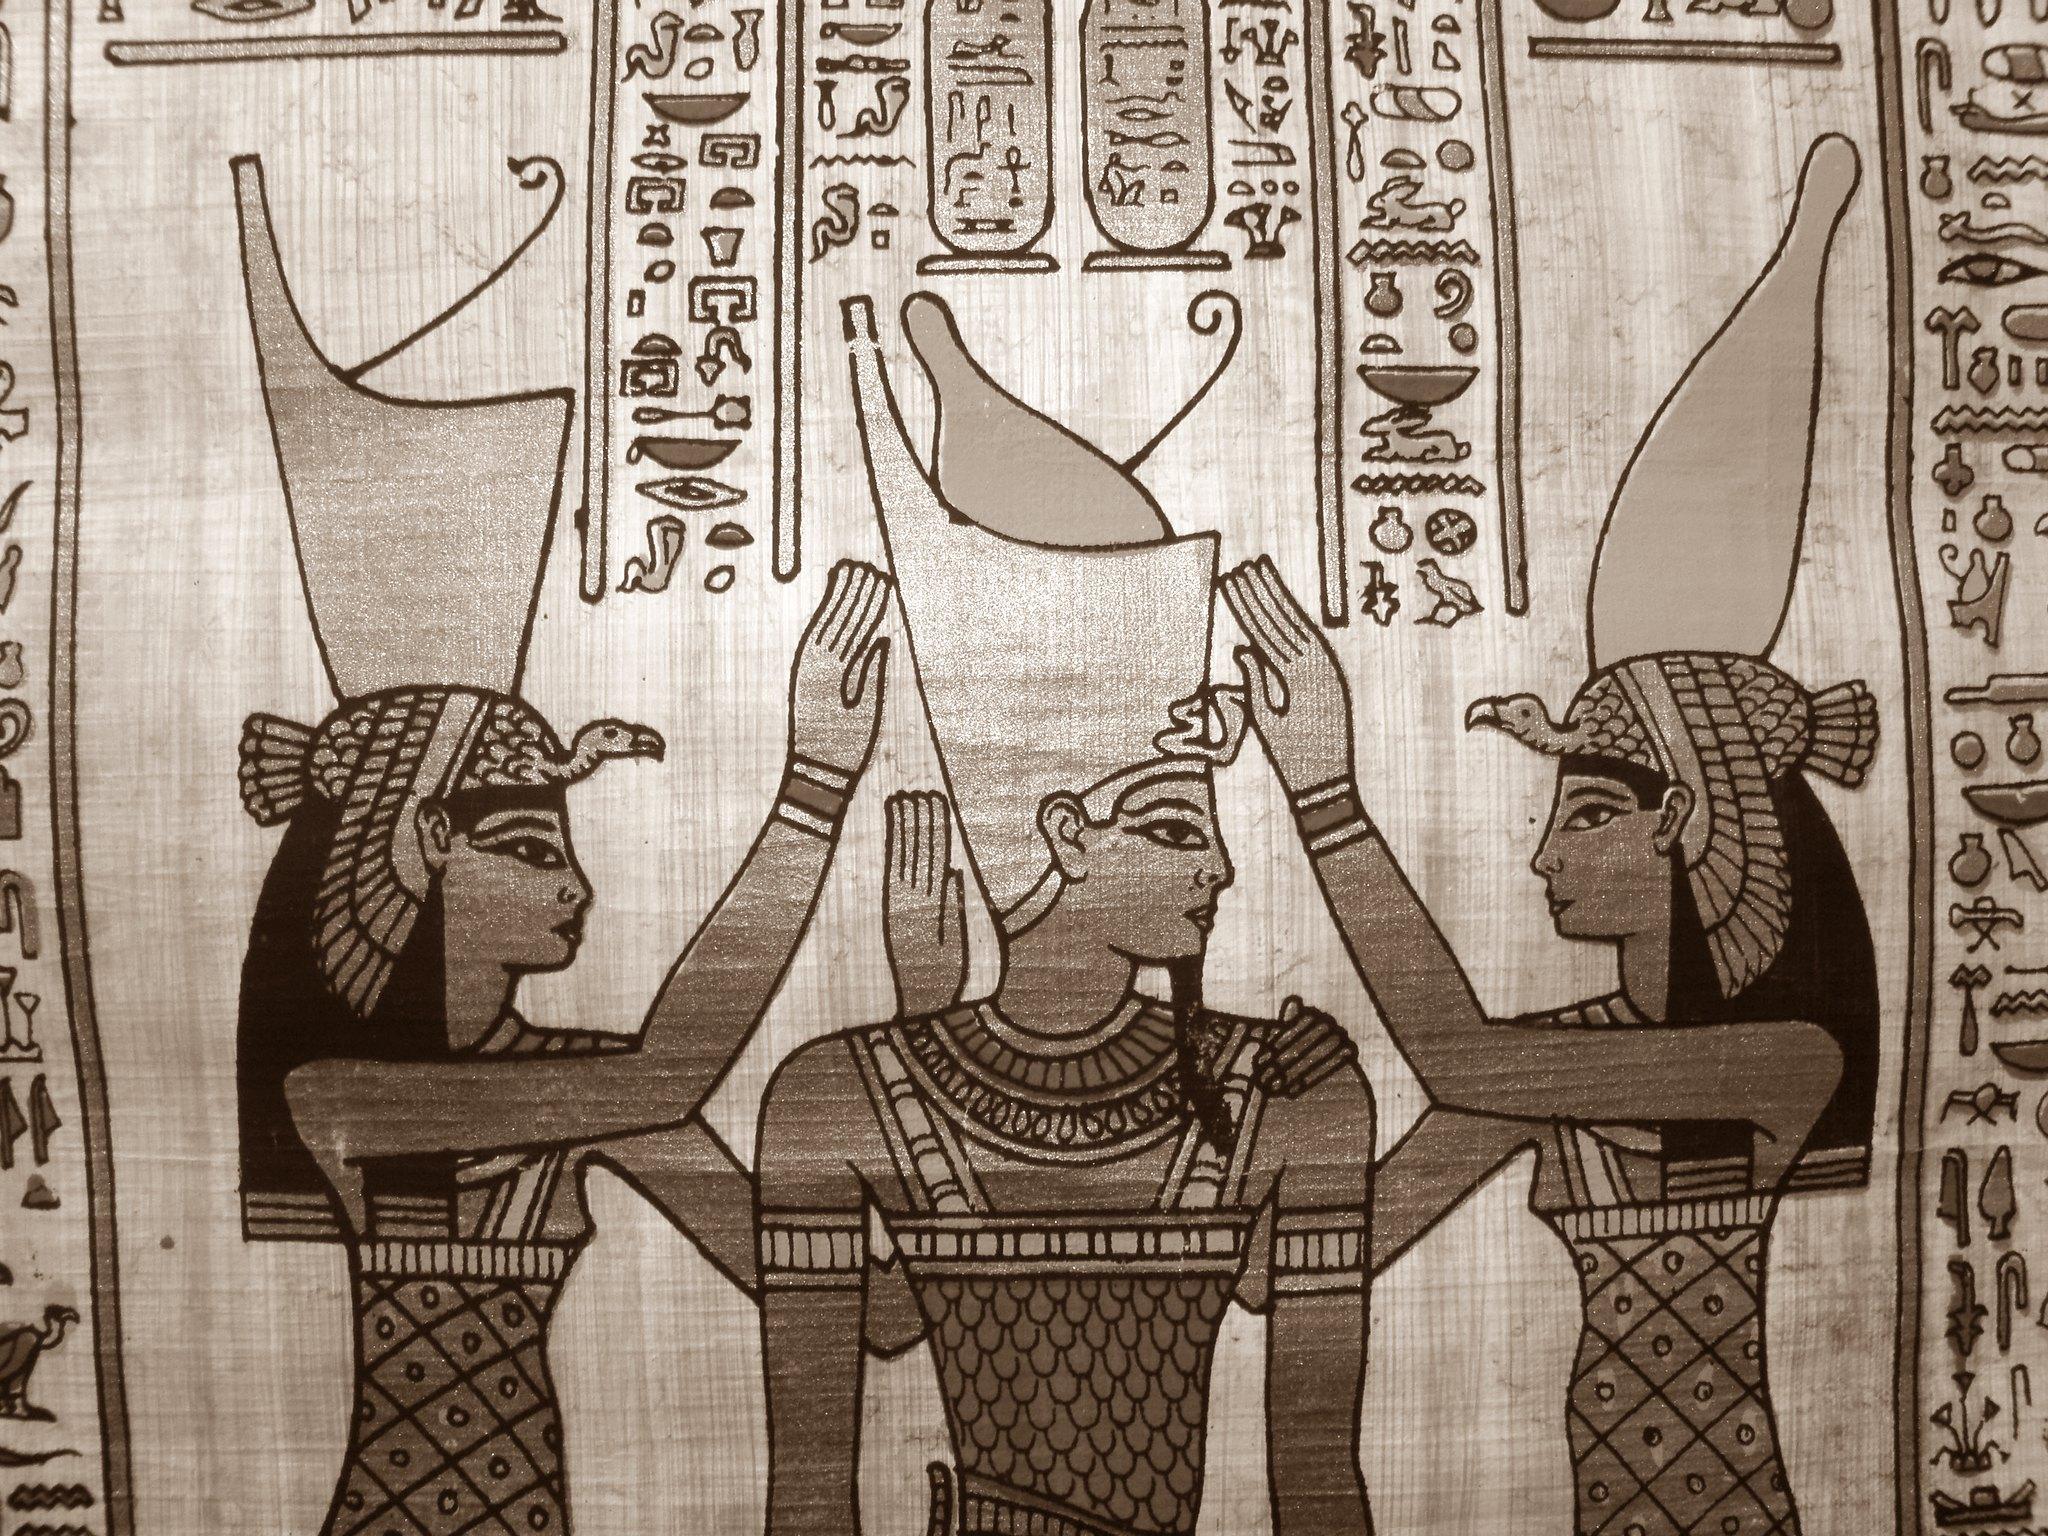 Vista de un papiro egipcio